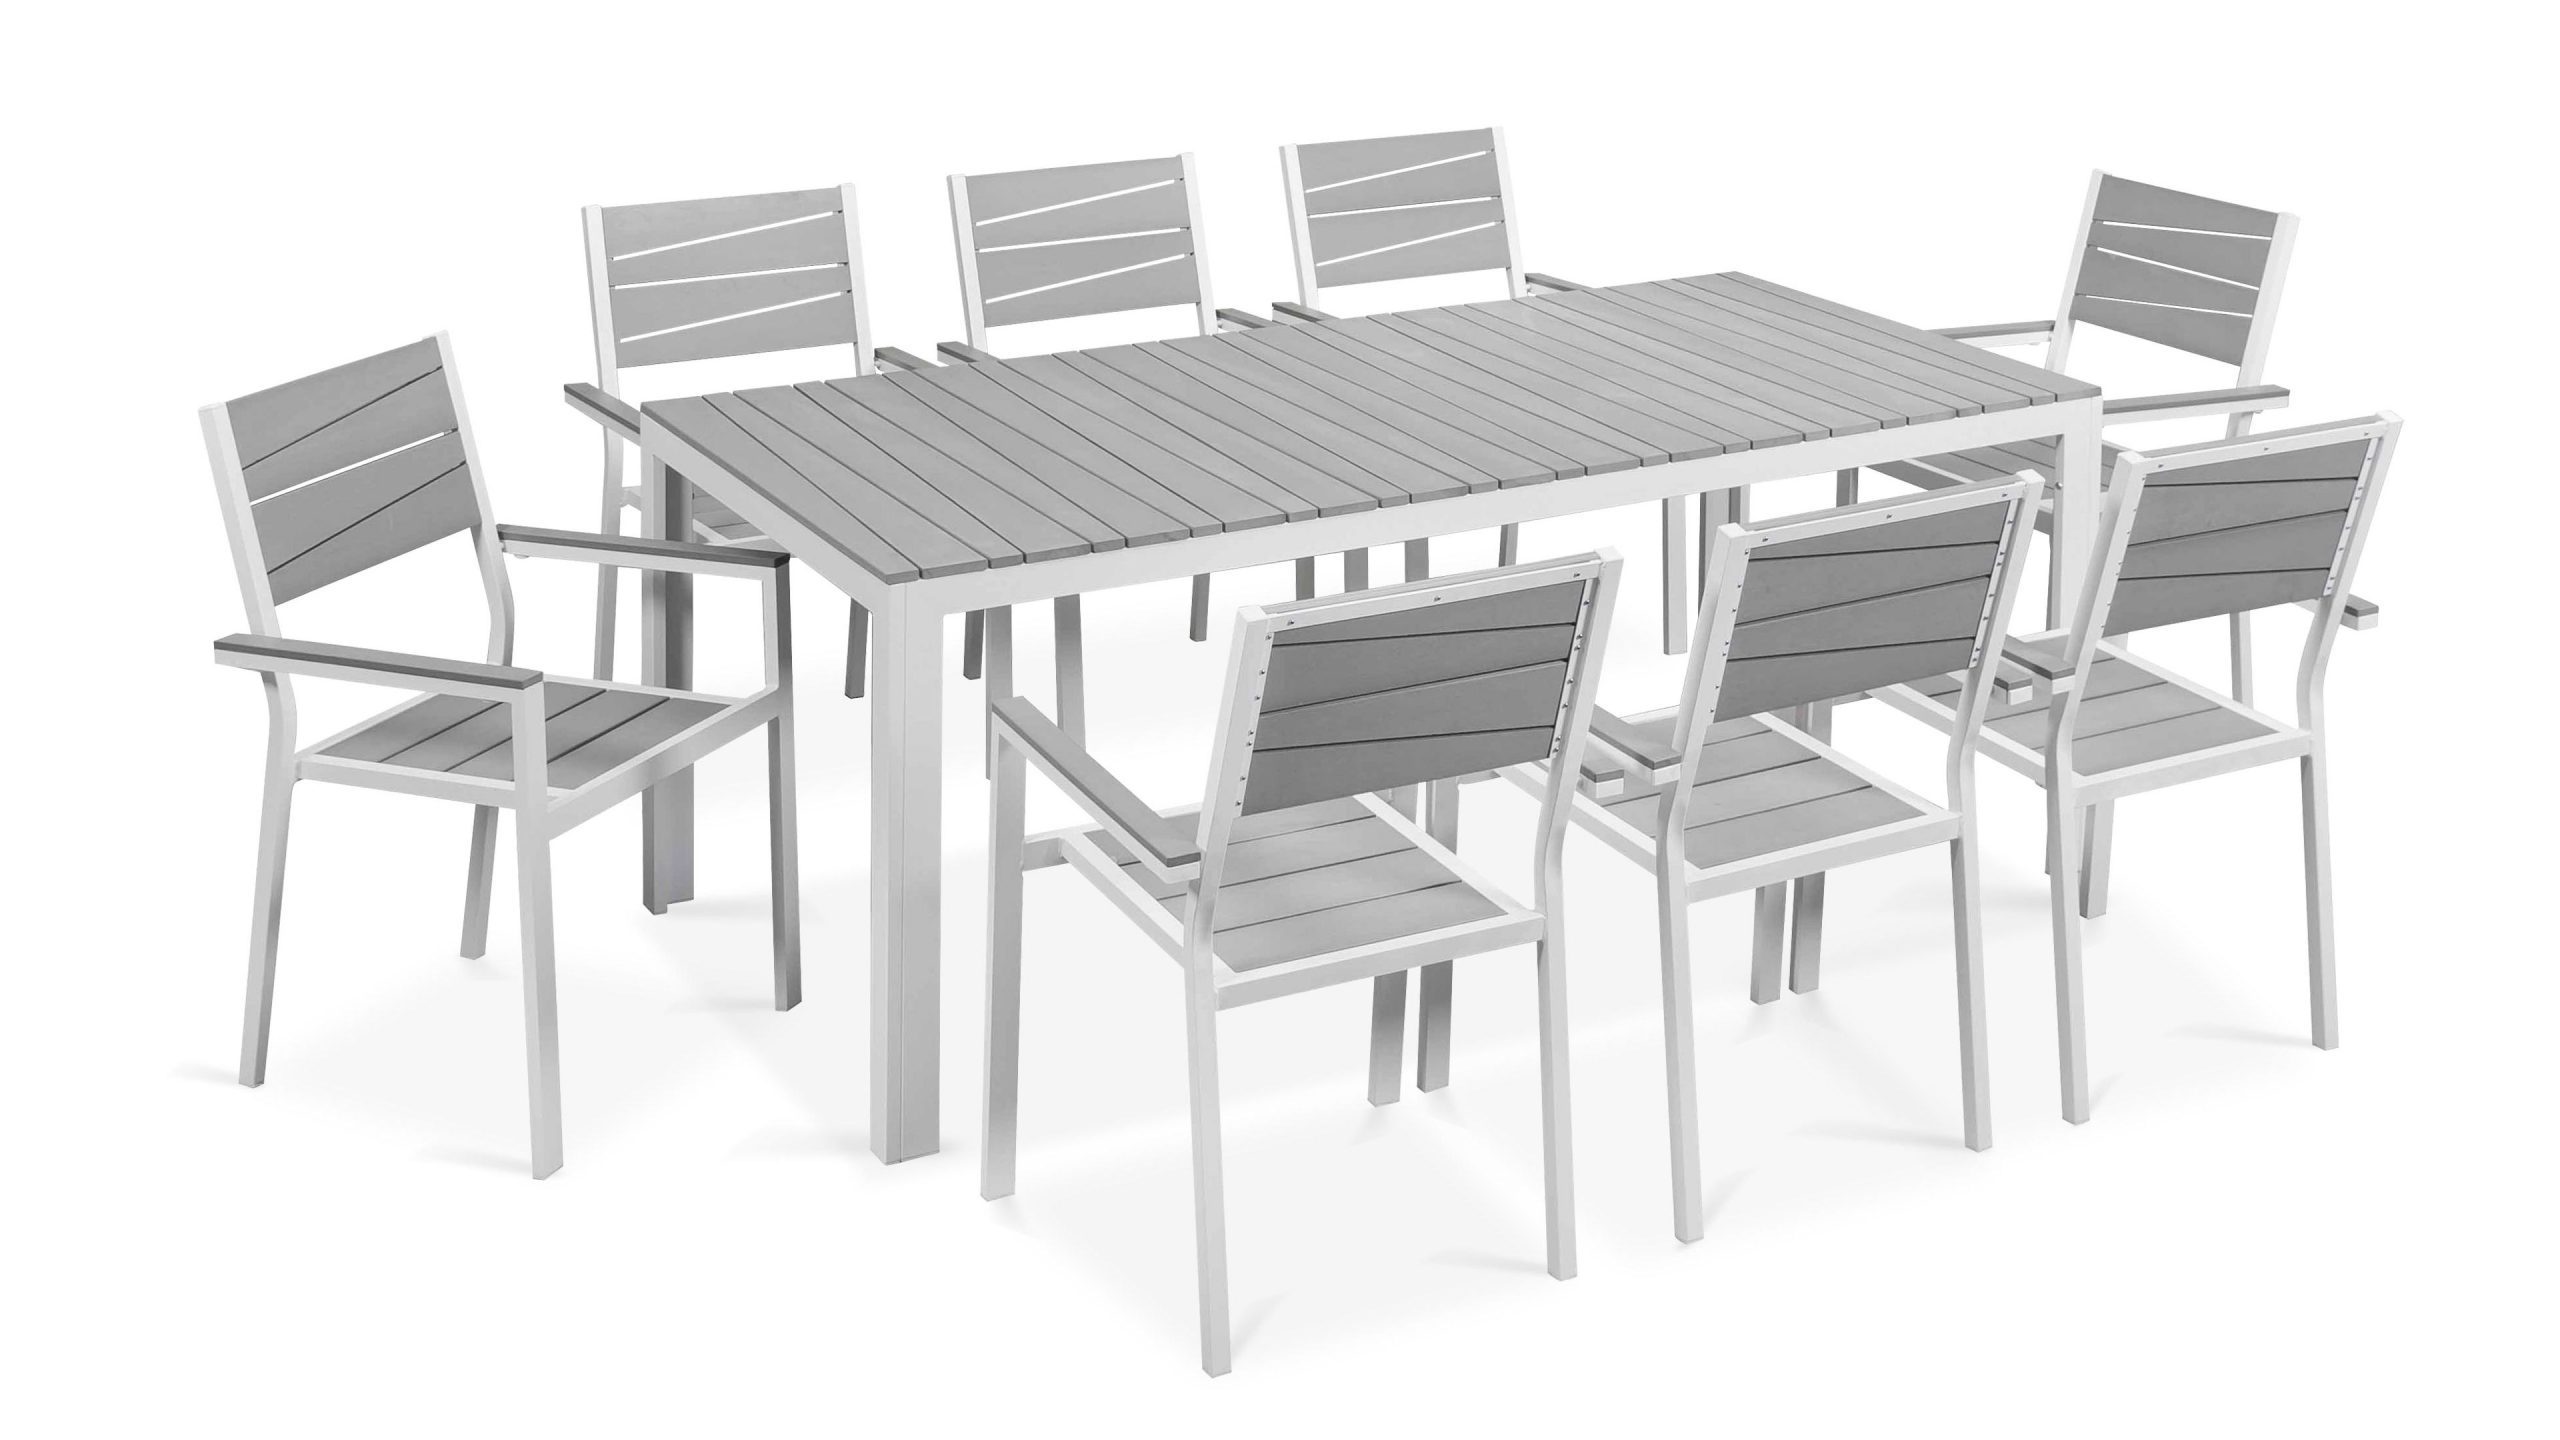 Table De Jardin 8 Places Aluminium Polywood intérieur Petit Salon De Jardin Pas Cher